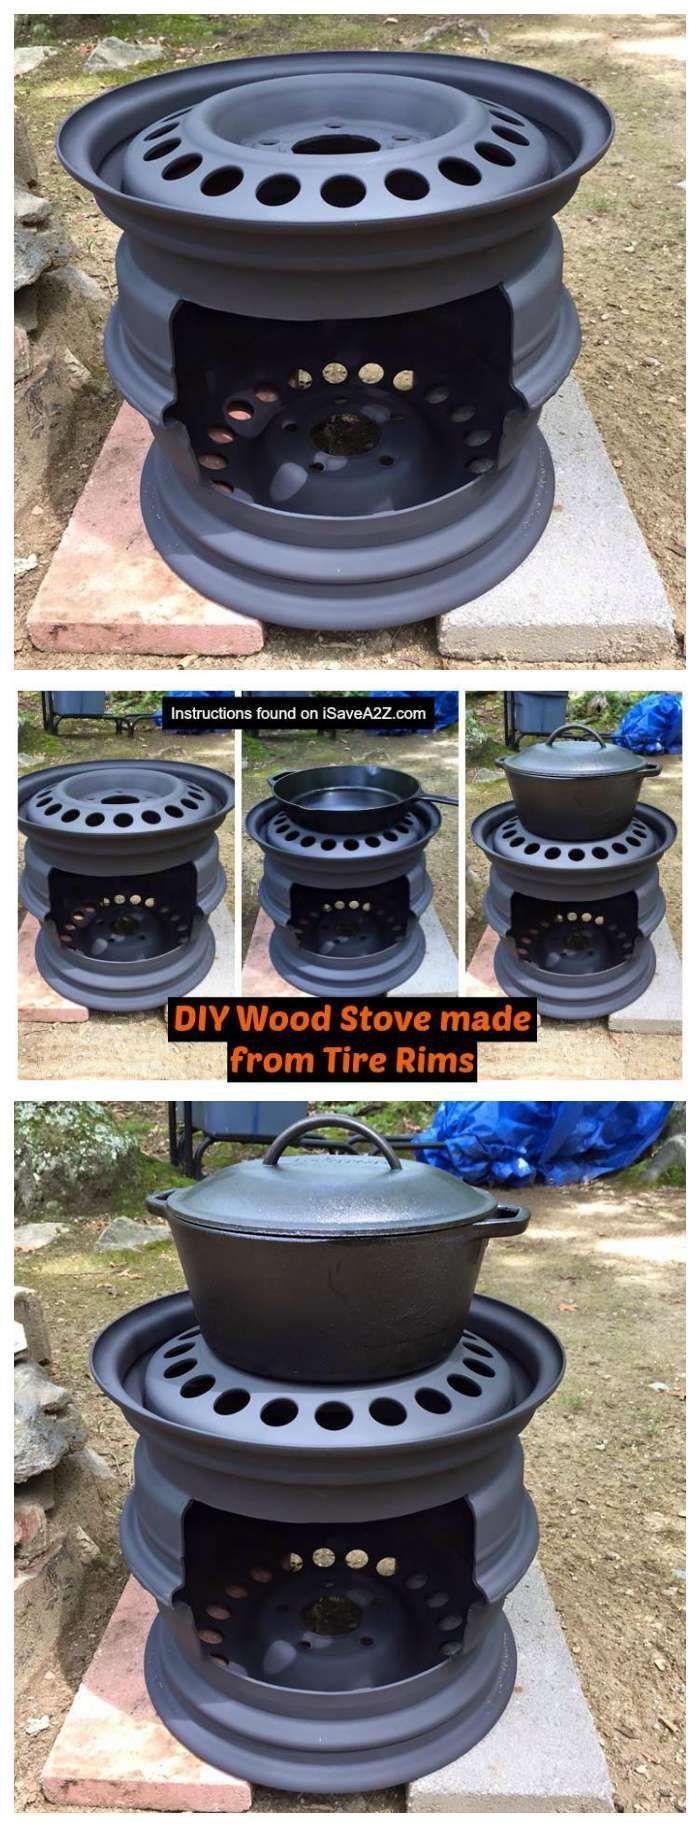 DIY Wood Stove made from Tire Rims   Diy wood stove, Skillet ...